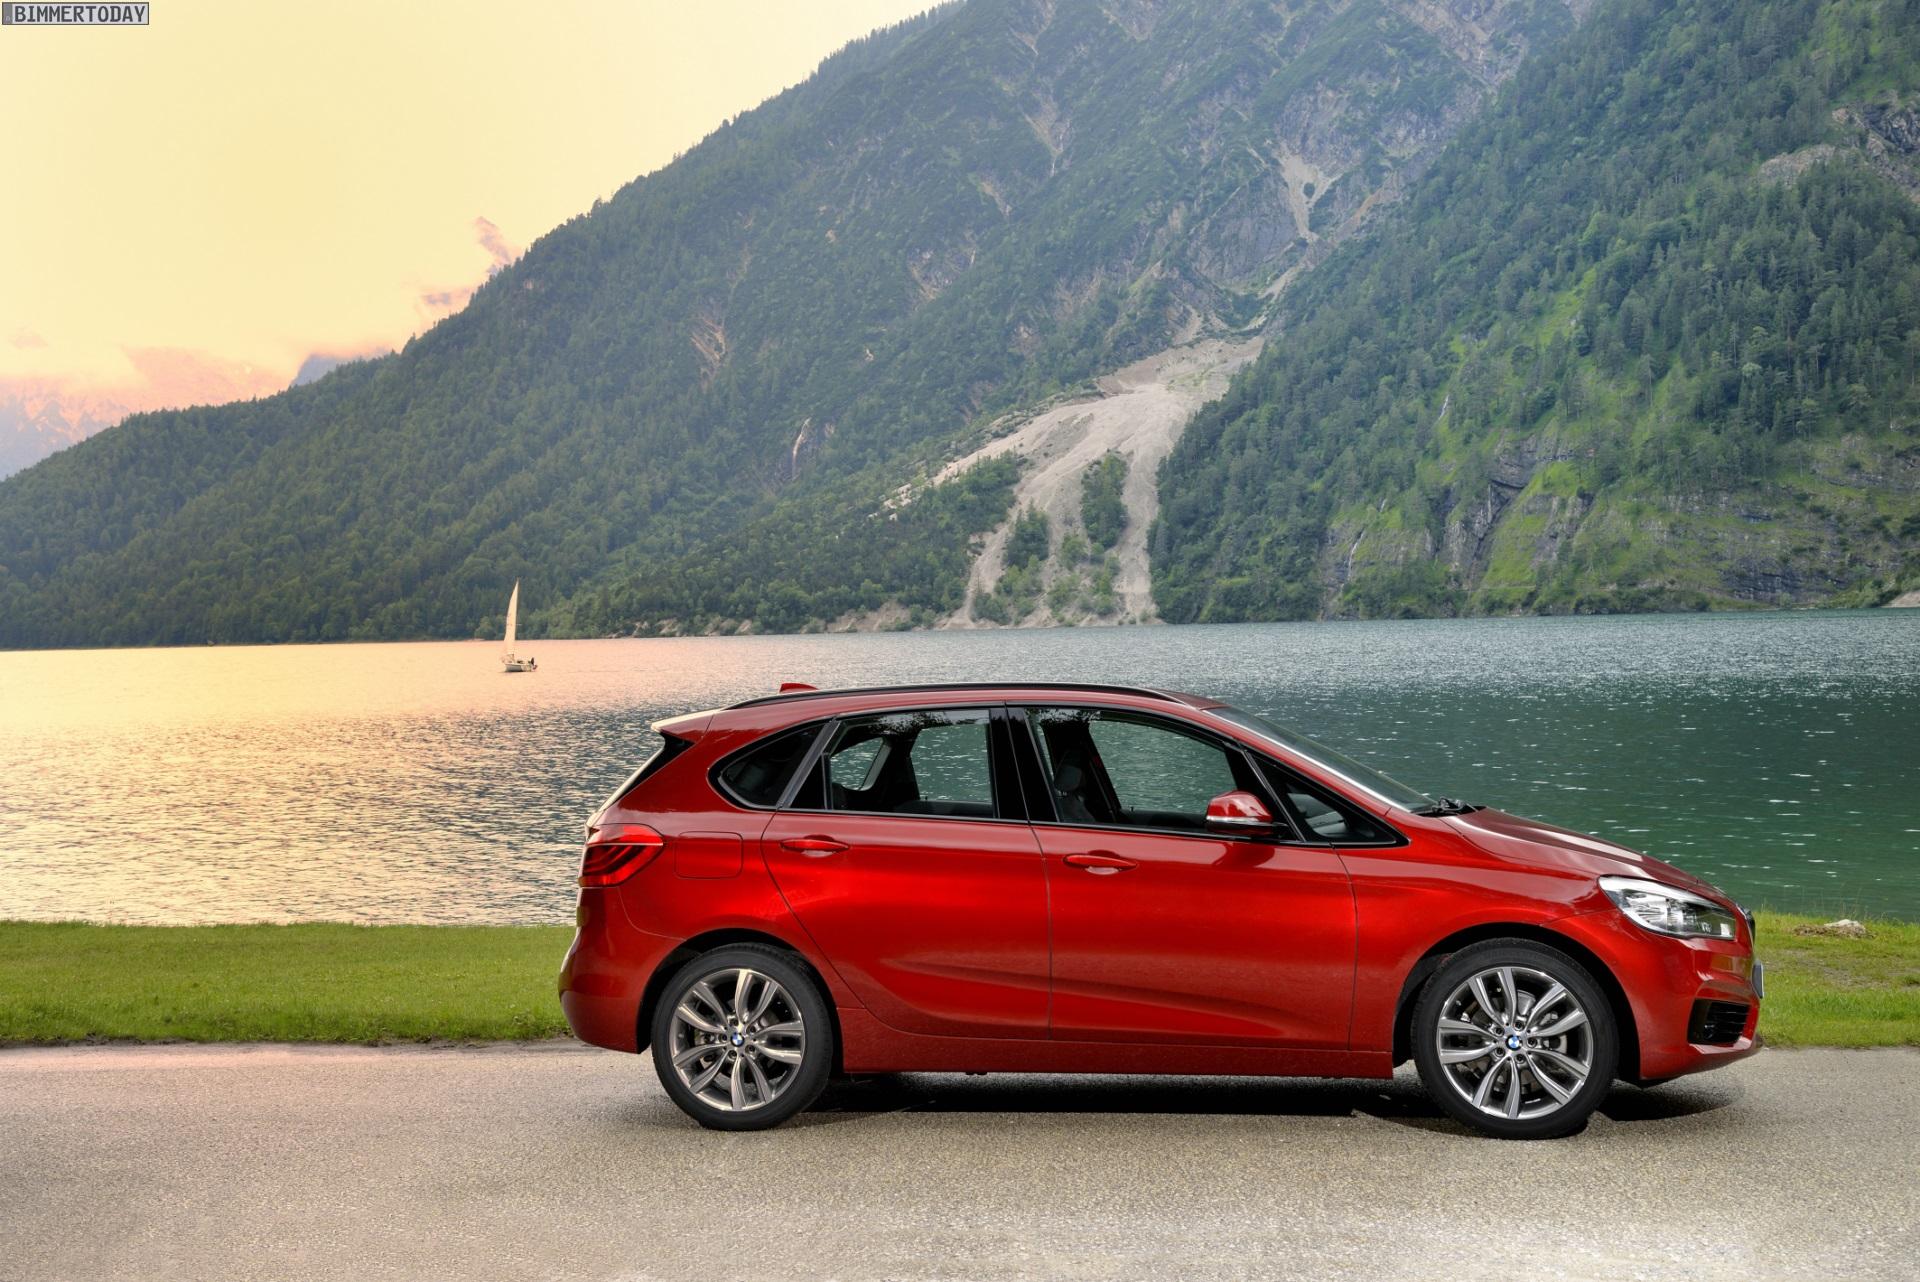 BMW 2er Active Tourer: xDrive für 220d & 225i ab 38.600 Euro